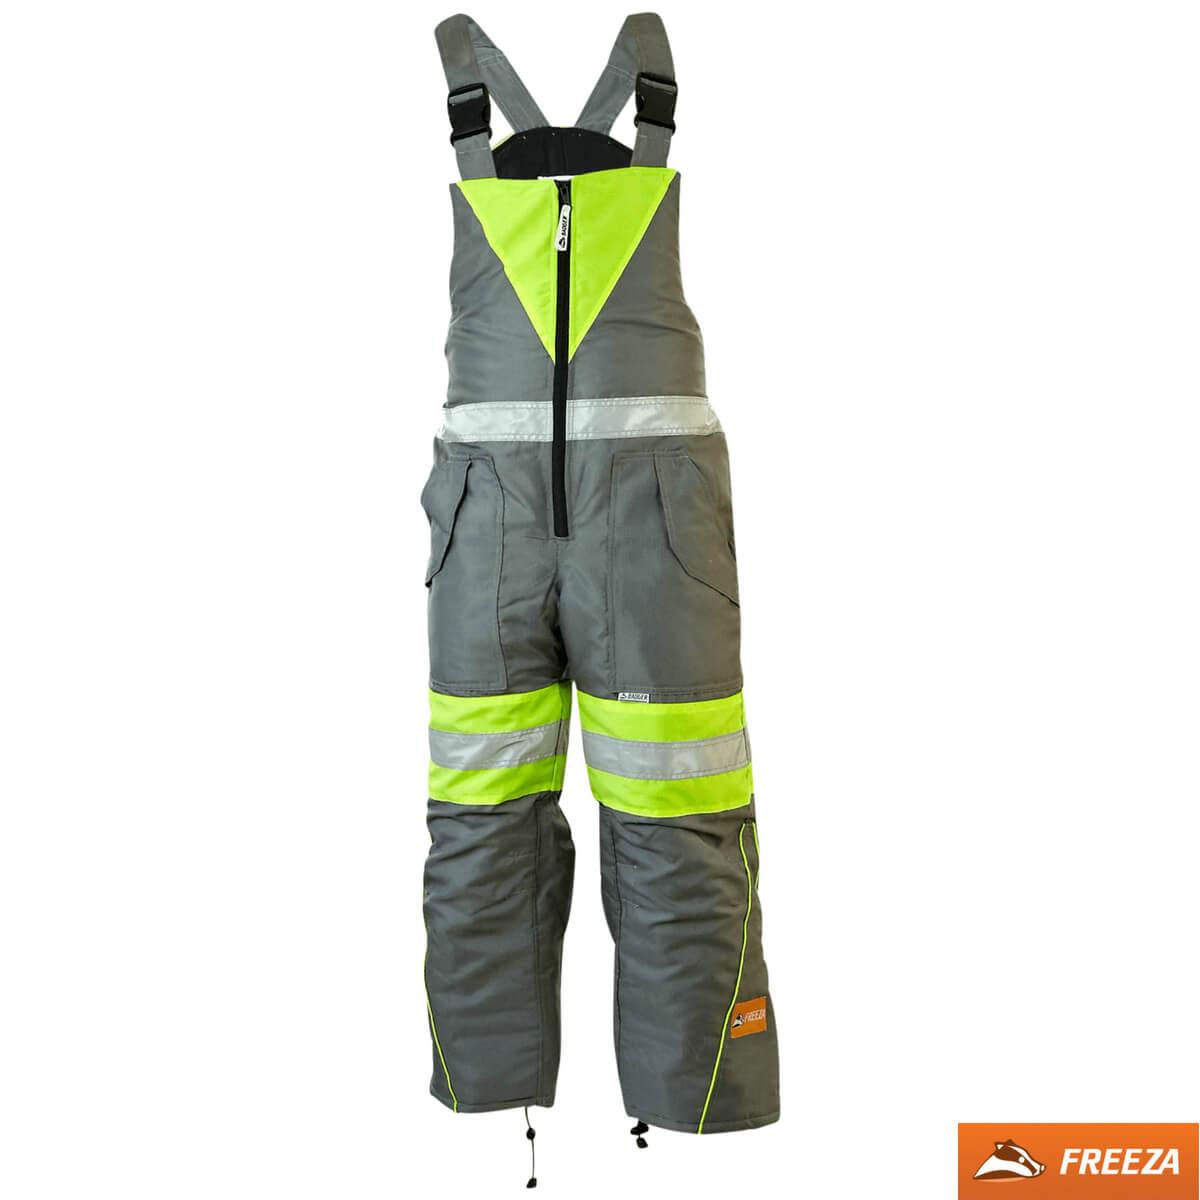 62171d6ffbe Badger X250 Freeza® Freezer Trouser - Badger Australia